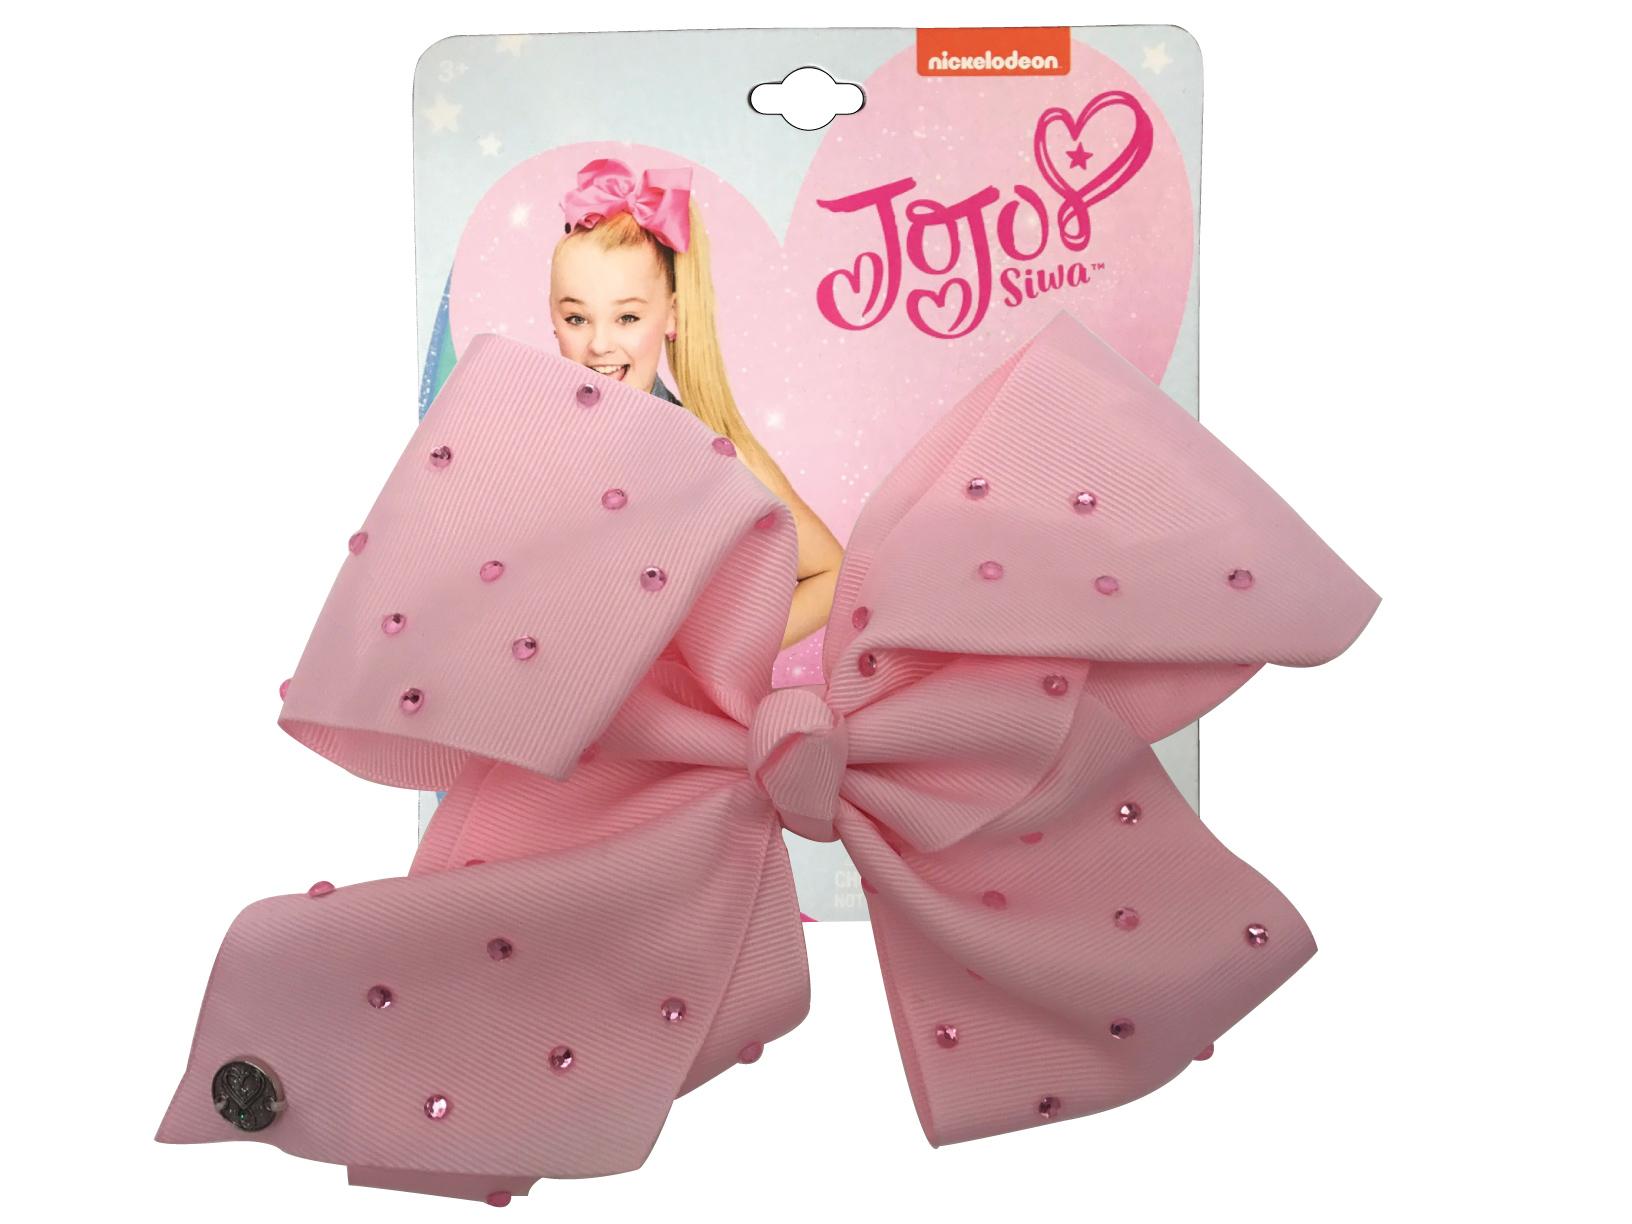 JoJo Siwa Large Cheer Hair Bow (Pink w/Rhinestones)